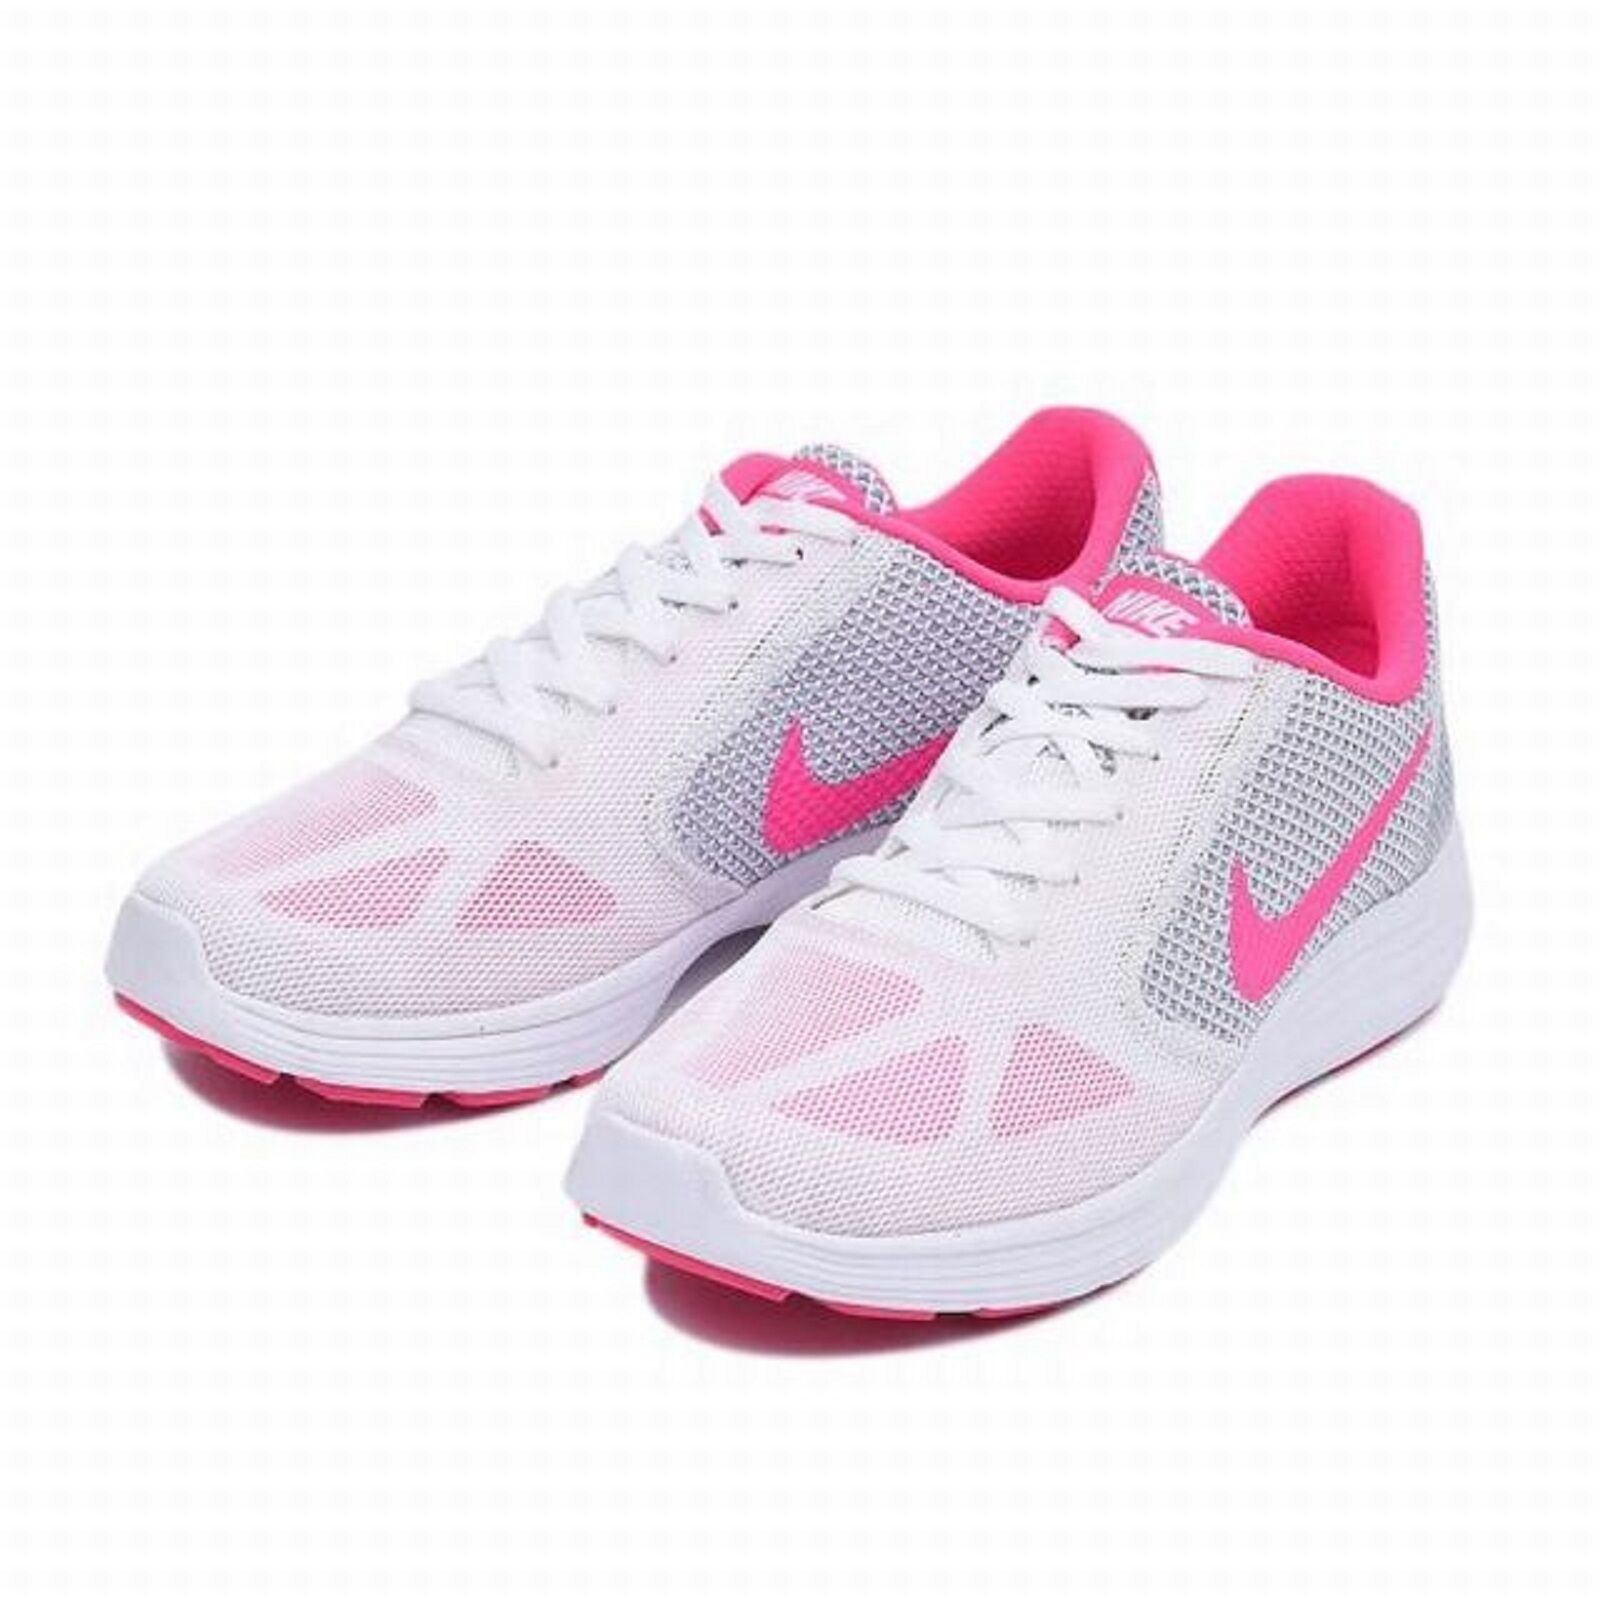 NIKE Ladies 'REVOLUTION 3' Running shoes White Pink Grey  Sz. 9 M  NIB